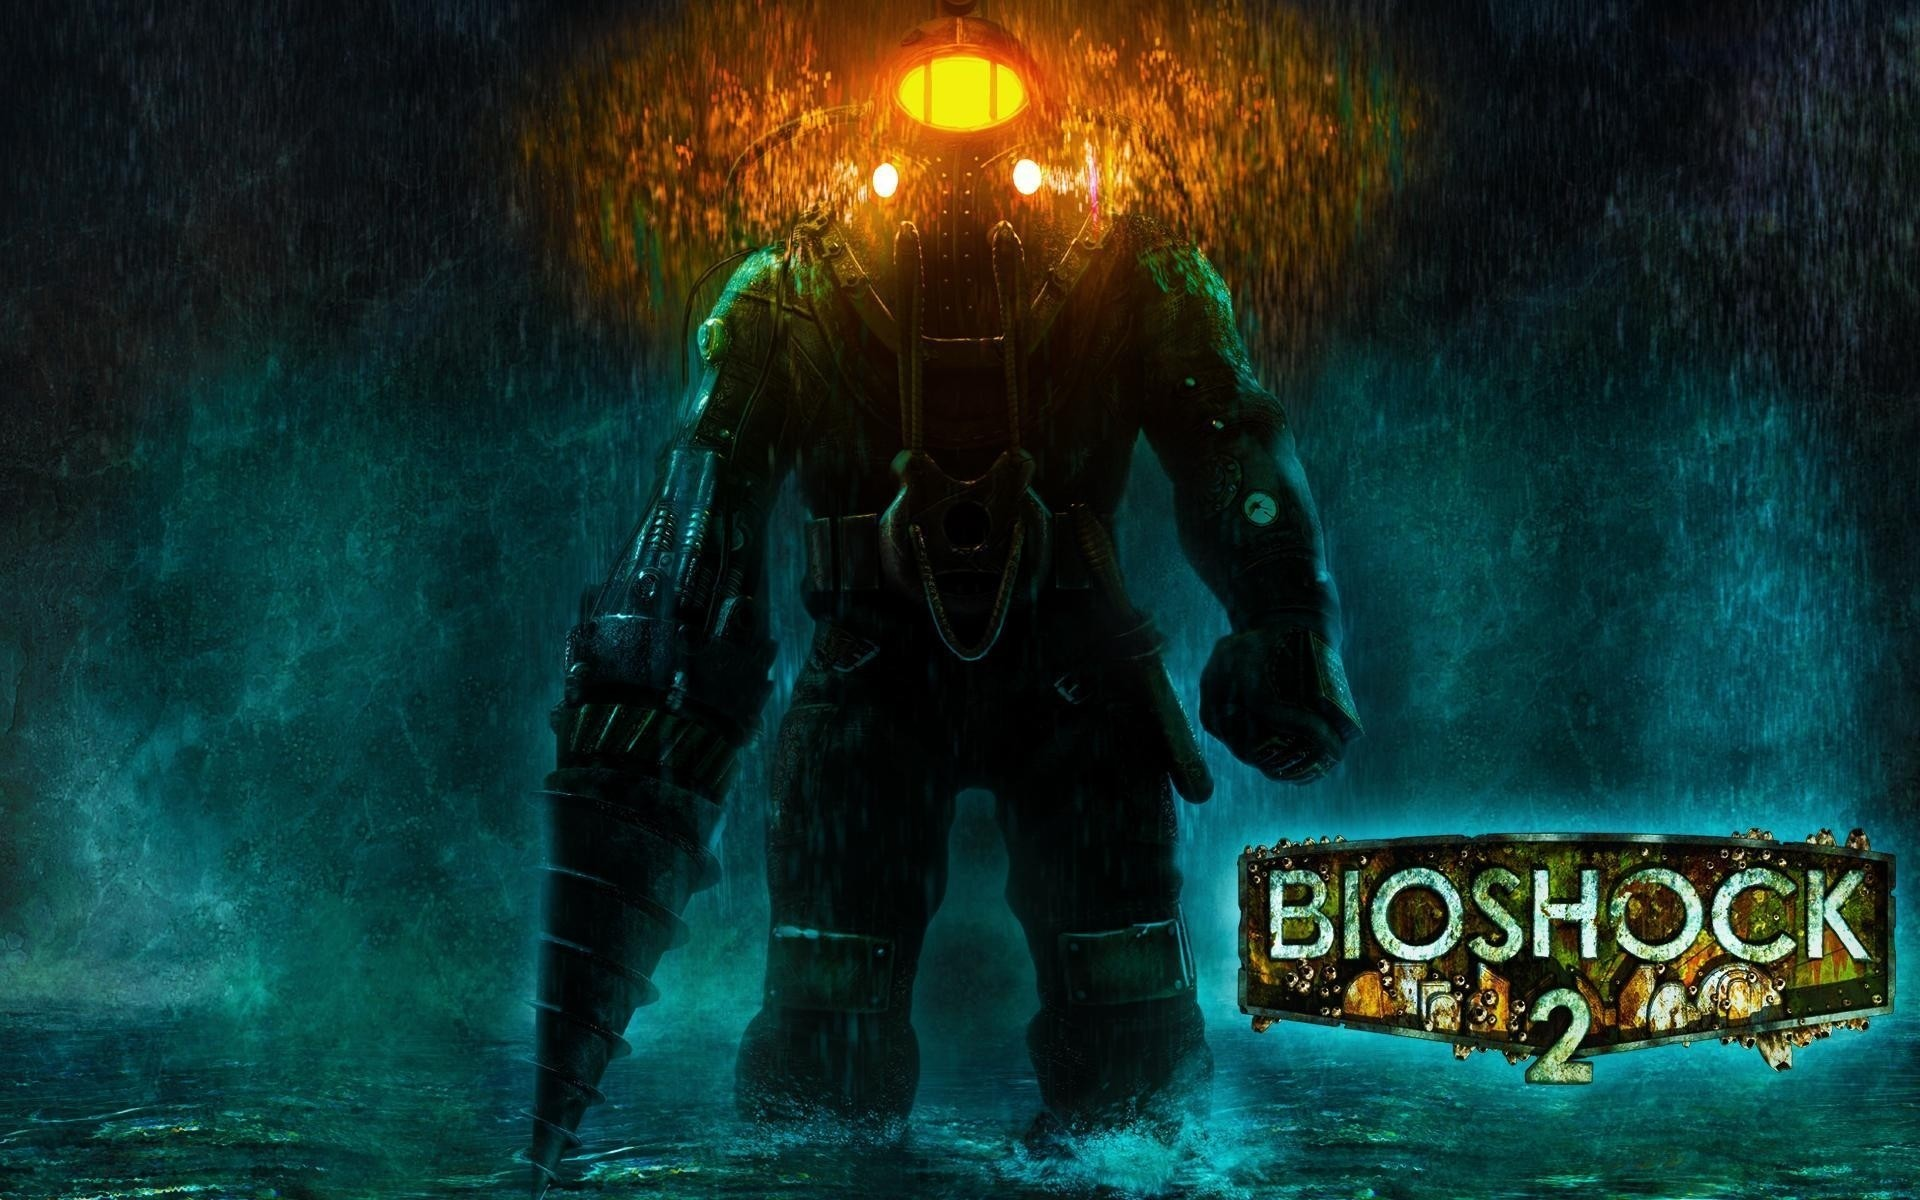 1920x1080 Bioshock 2 Big Sister Picture